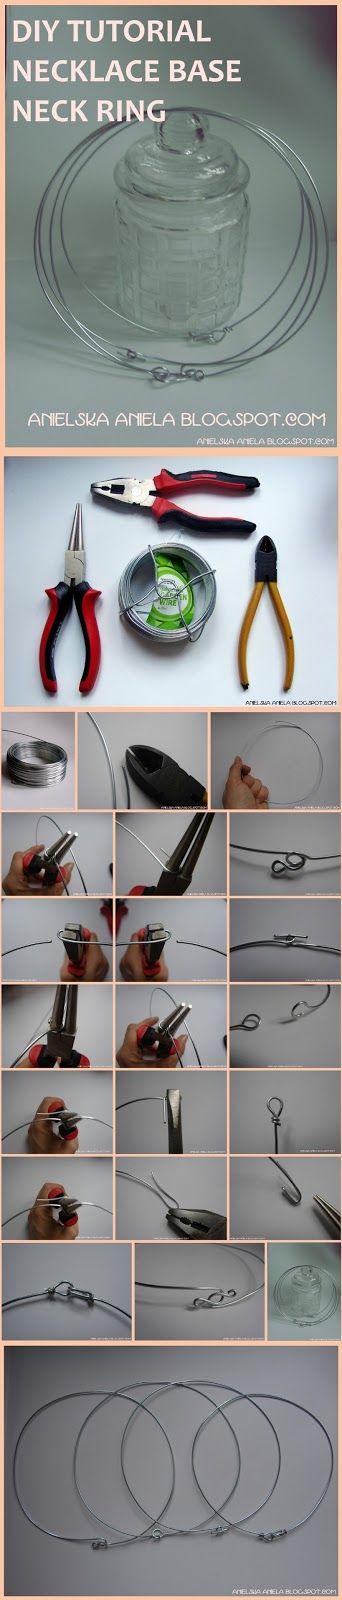 diy tutorial necklace base or metal ring collar necklace